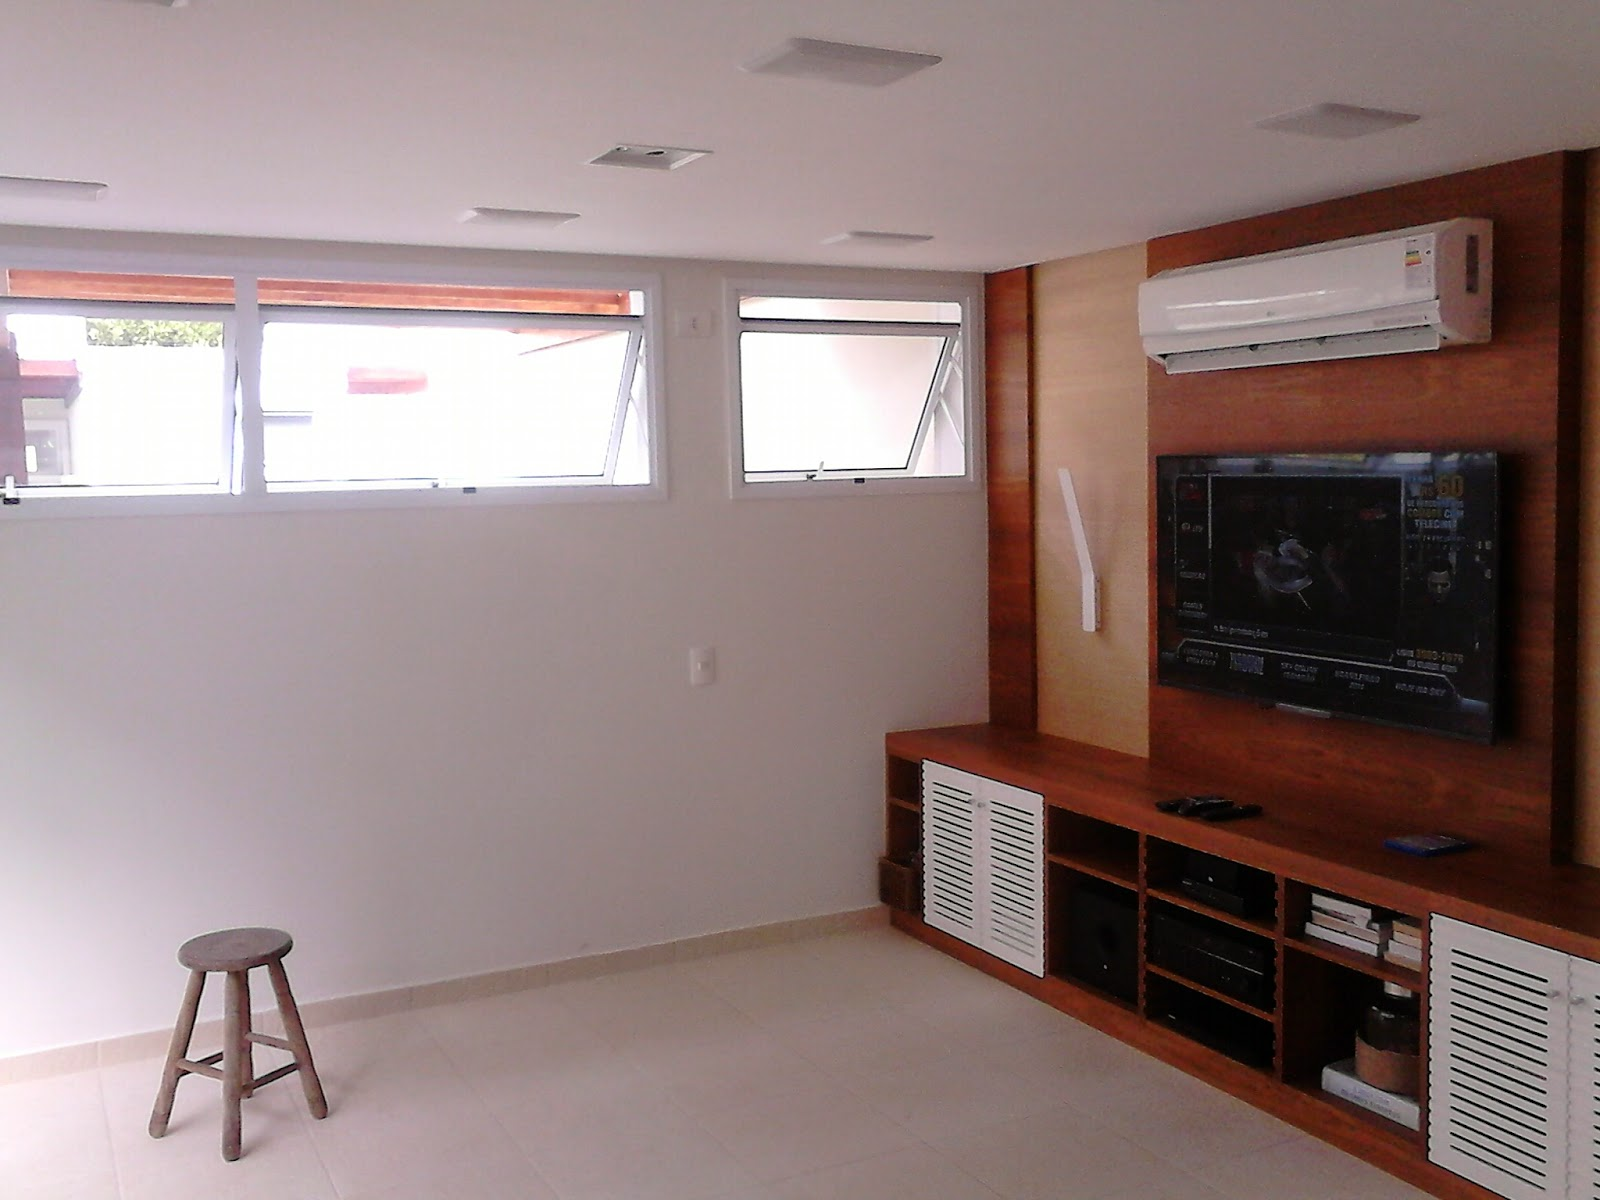 Home Theater Instalamax Litoral -> Sanca De Gesso Sala De Tv